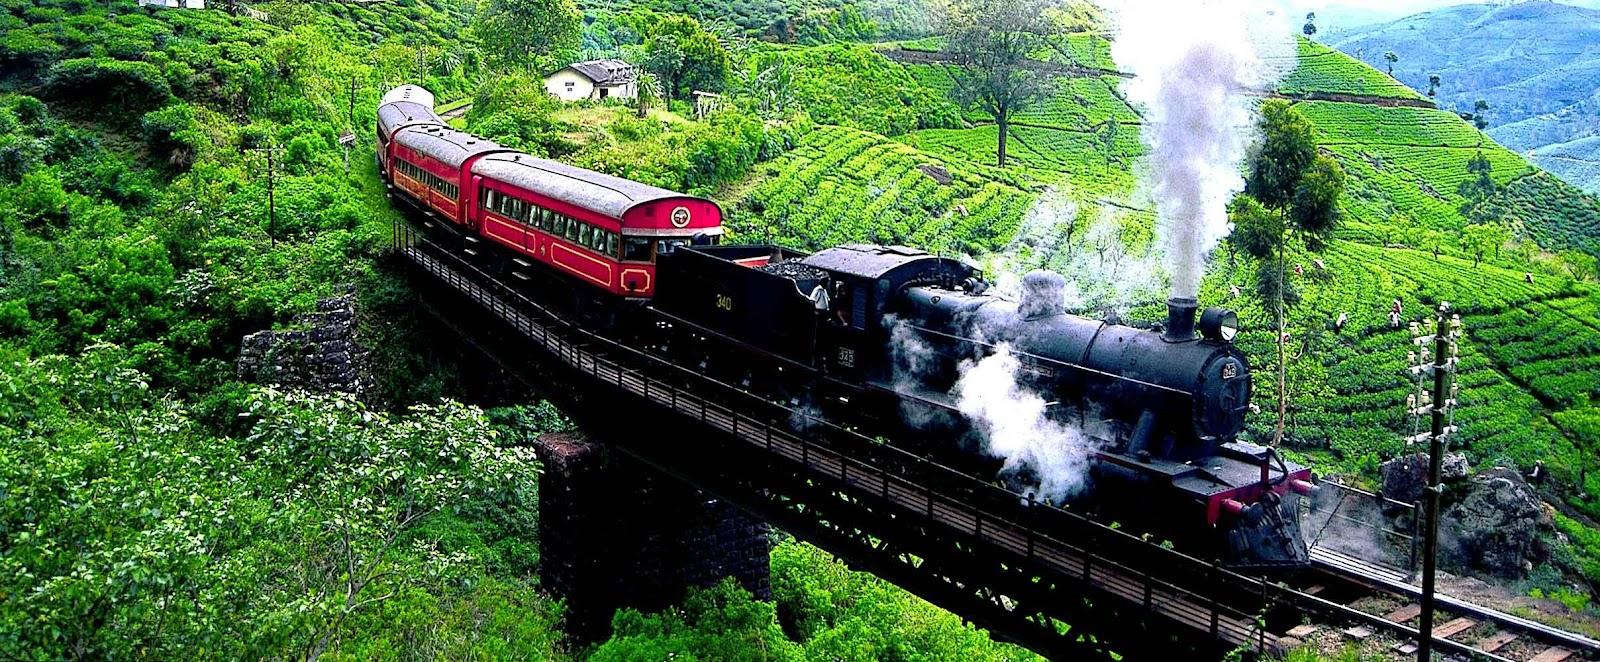 http://a1travels.lk/wp/wp-content/uploads/2015/10/sri-lanka-train-tours.jpg